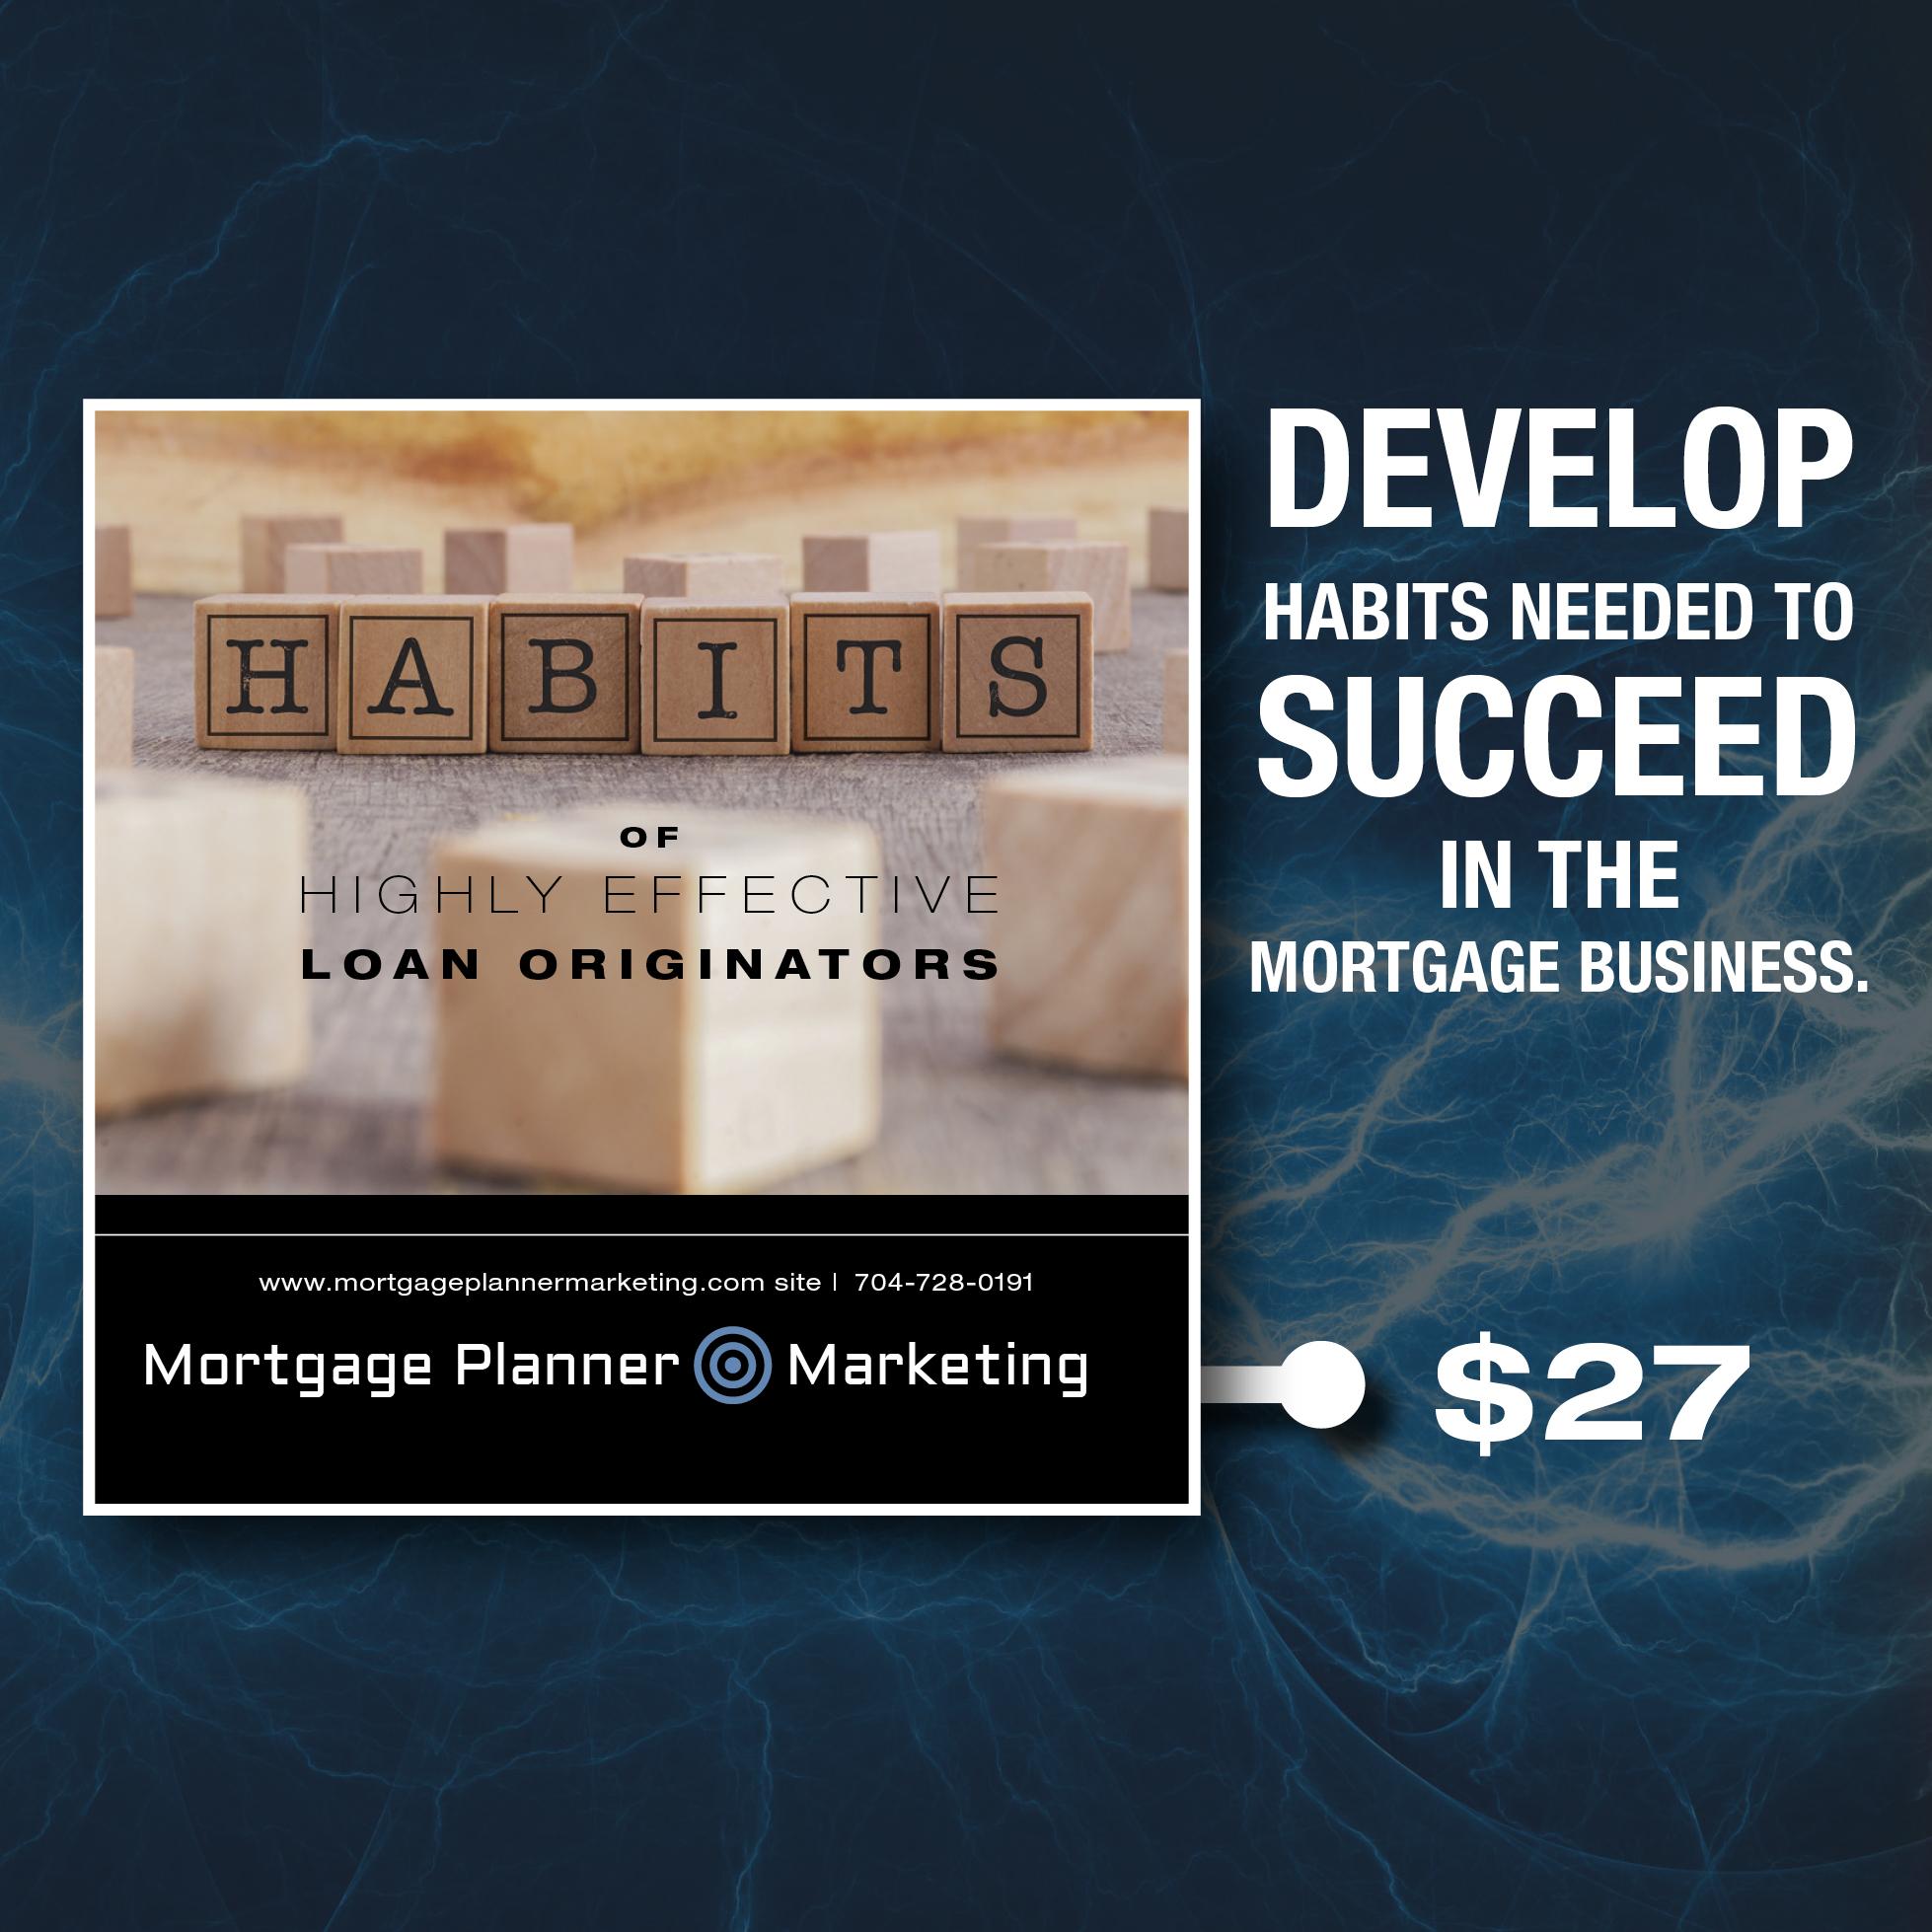 BradsOnlineBooks-habits.jpg